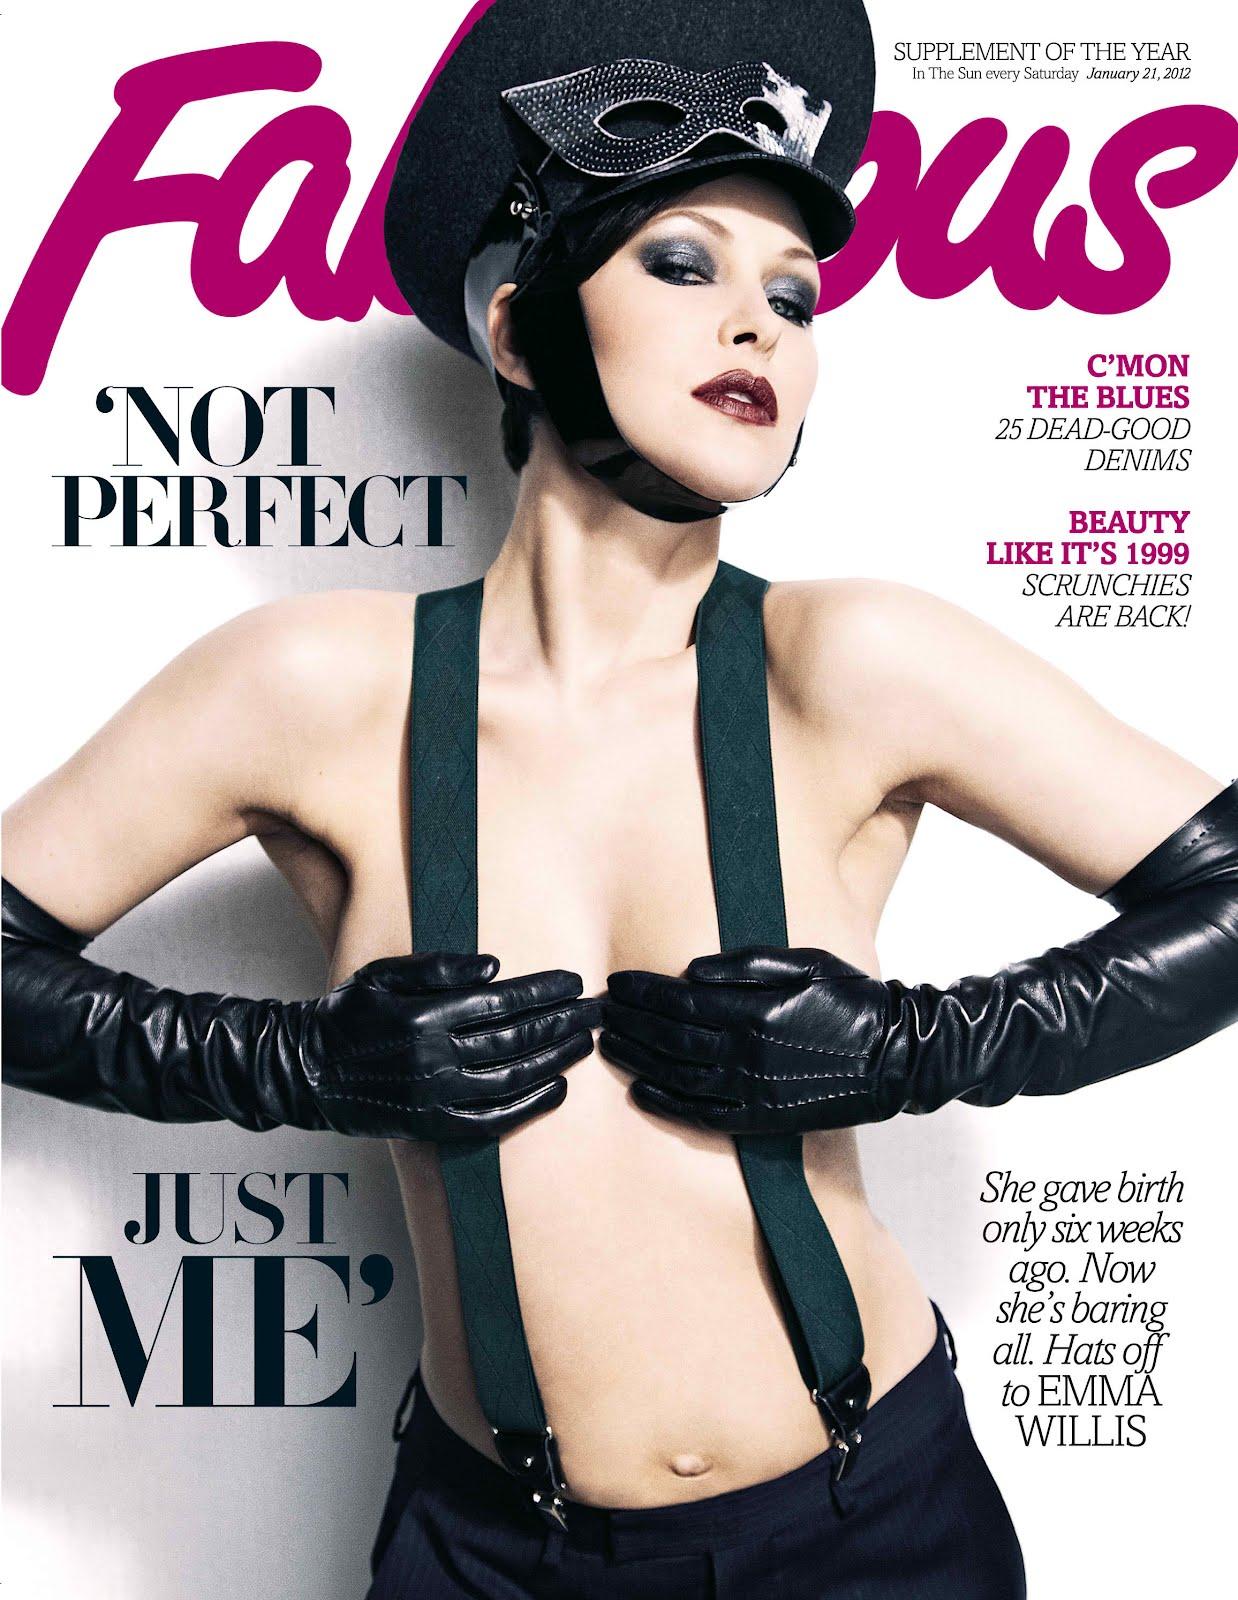 http://4.bp.blogspot.com/-FW_lg3l4MDY/T9AA4LRNIRI/AAAAAAAAEC4/OjTRdTTTEKU/s1600/Emma_Willis_Fabulous.jpg